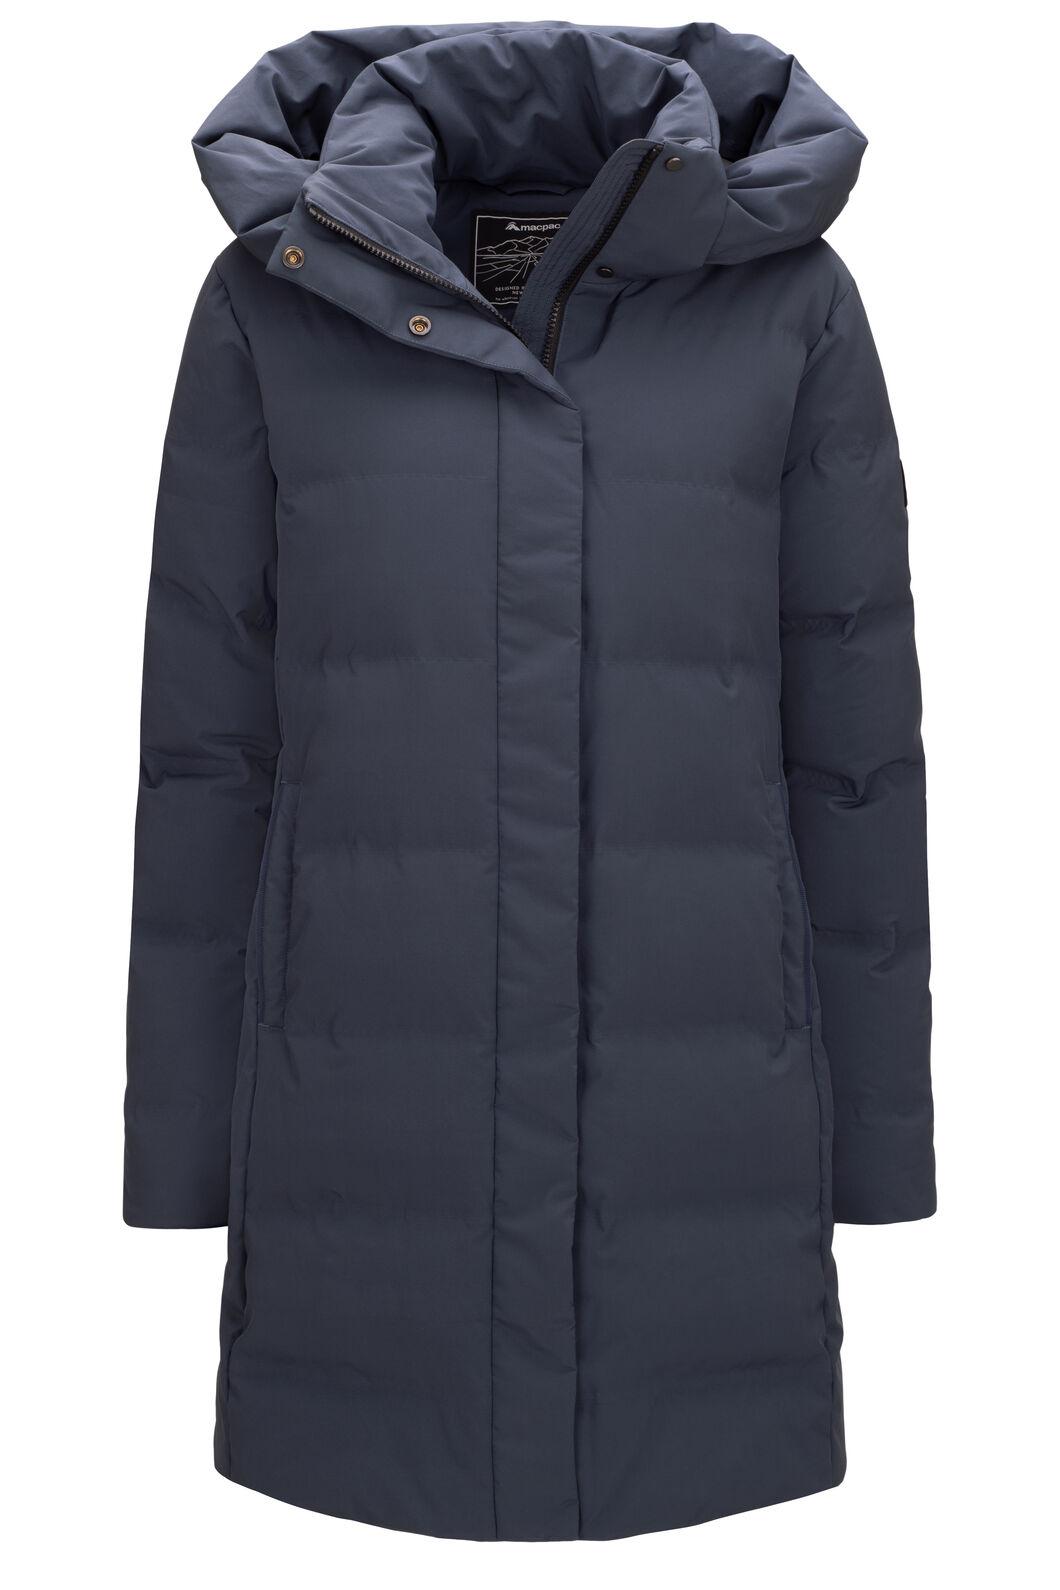 Macpac Narvi Down Coat — Women's, BLUE NIGHTS, hi-res